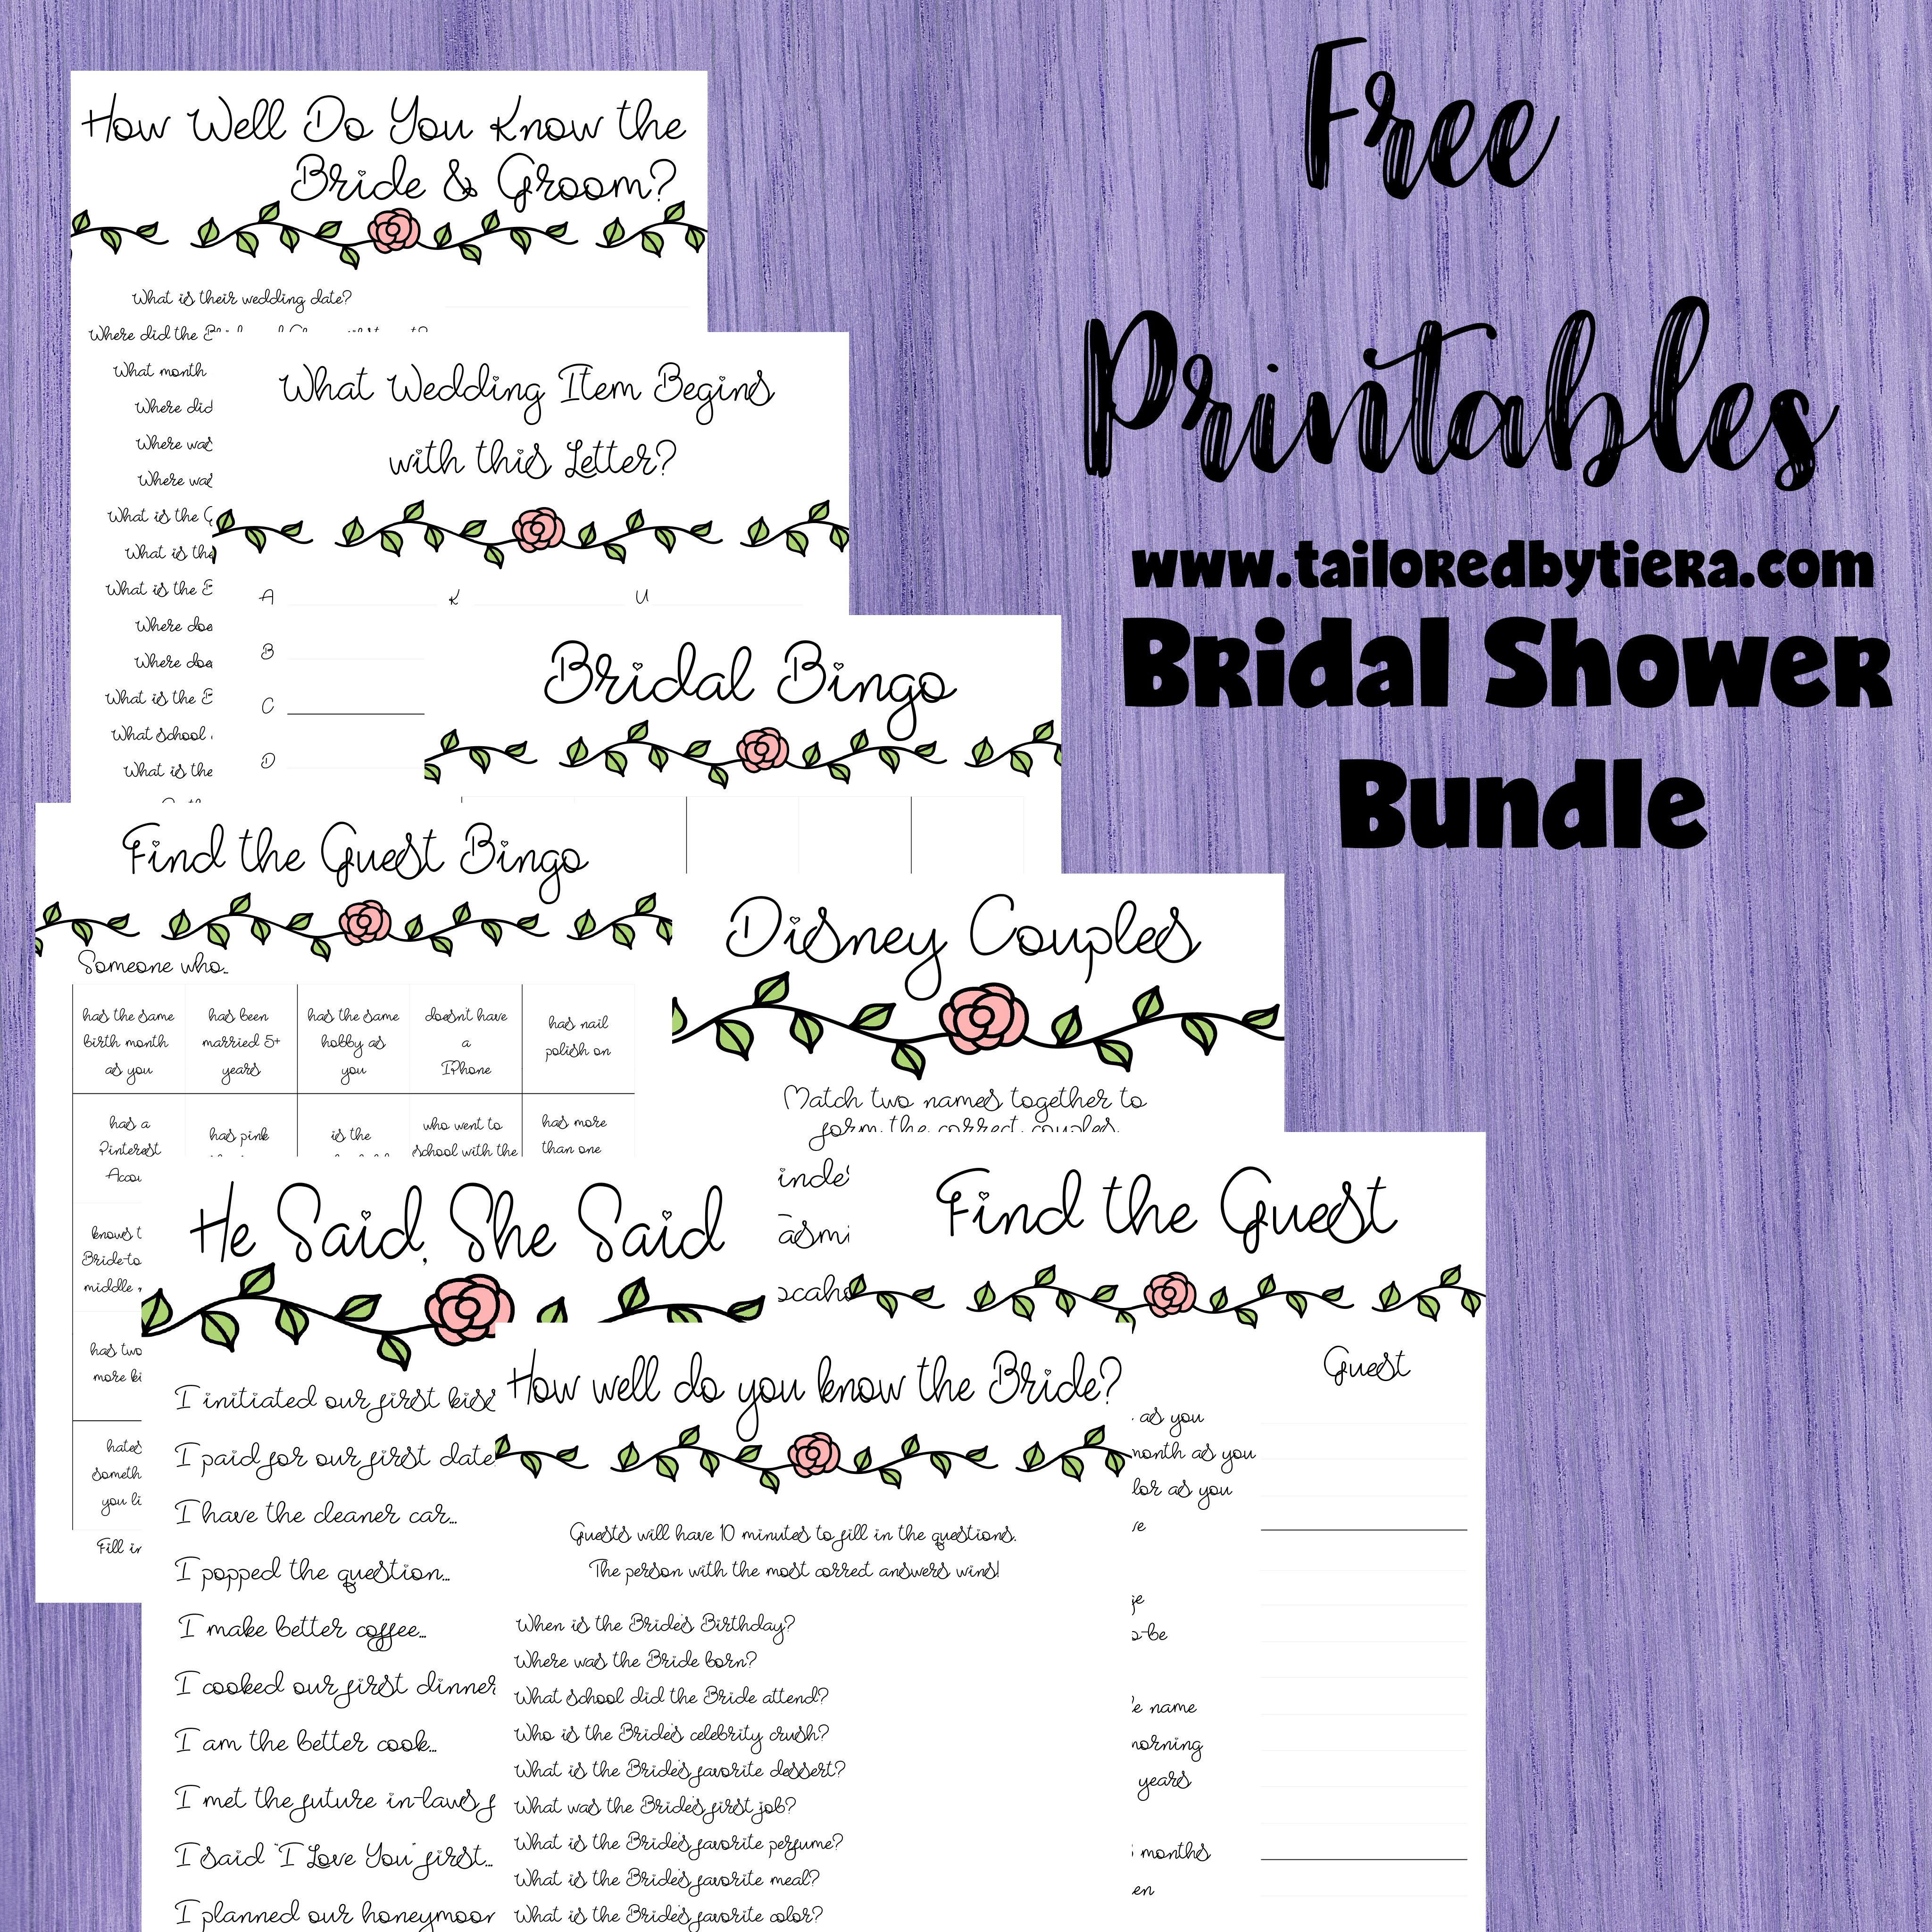 Charlotte Bridal Bundle: A Simple Floral Themed Bridal